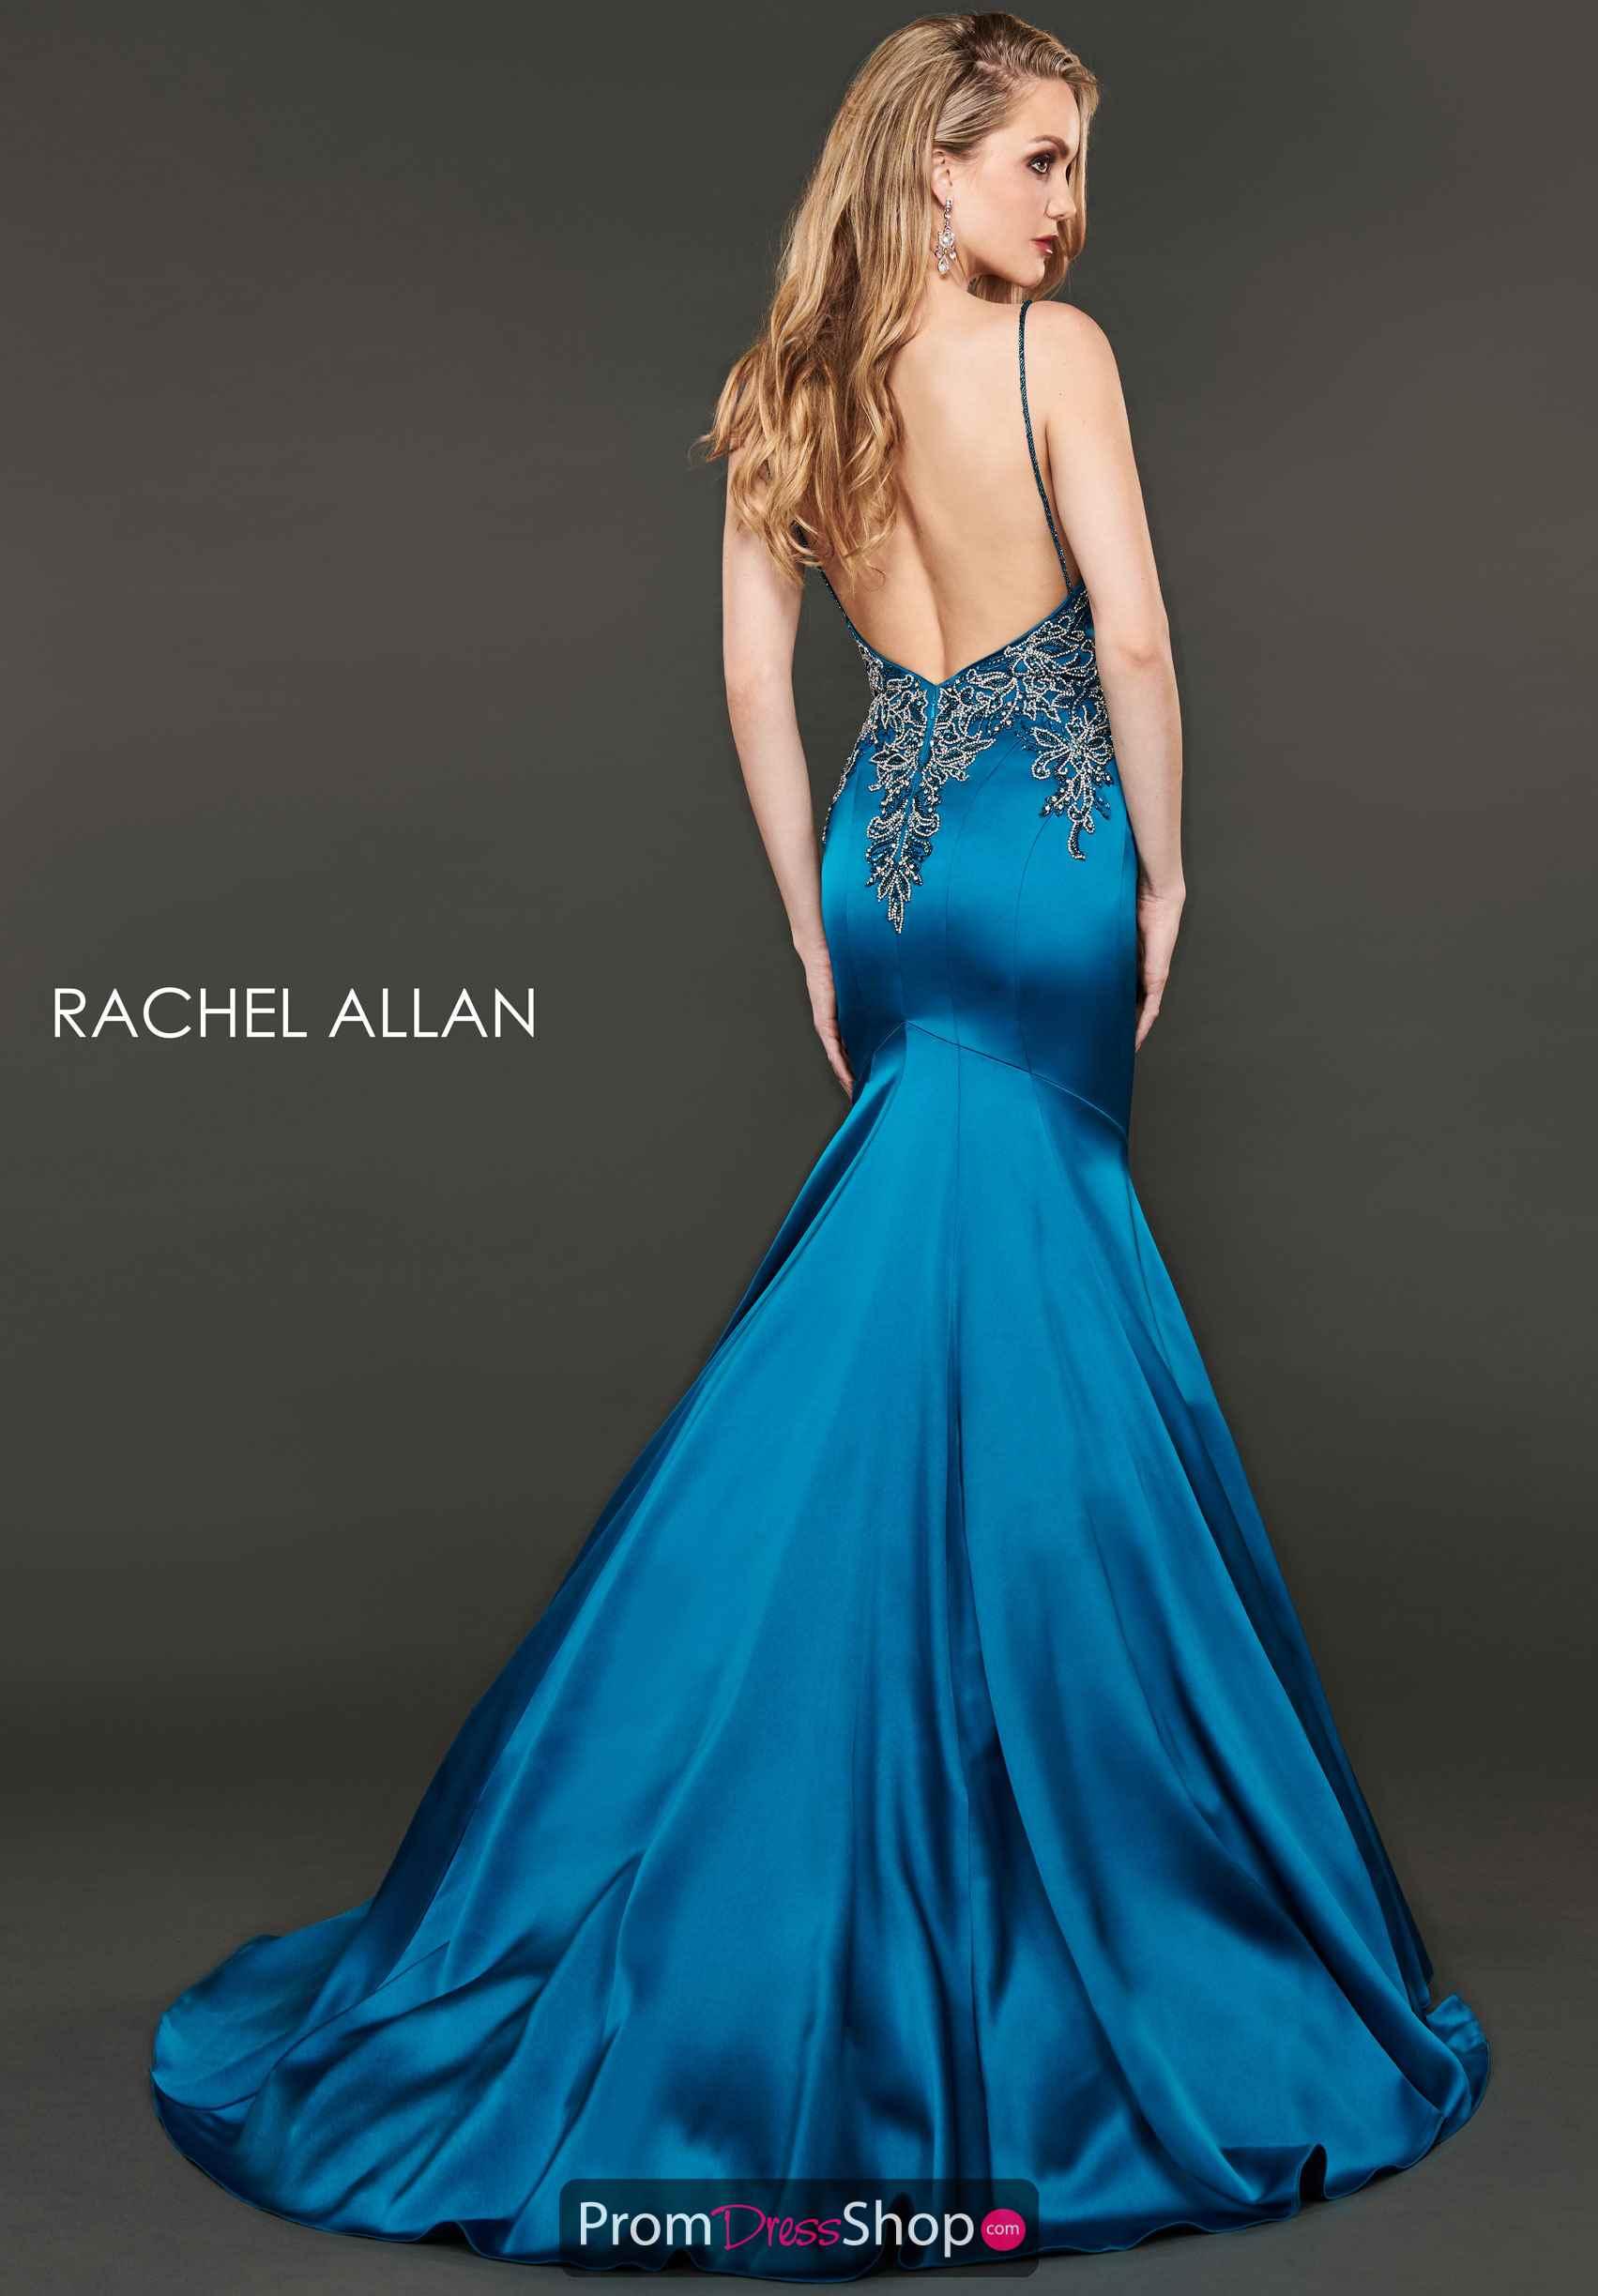 Rachel Allan Prom Dresses Prom Dresses Dresses Rachel Allan Dresses [ 2447 x 1703 Pixel ]